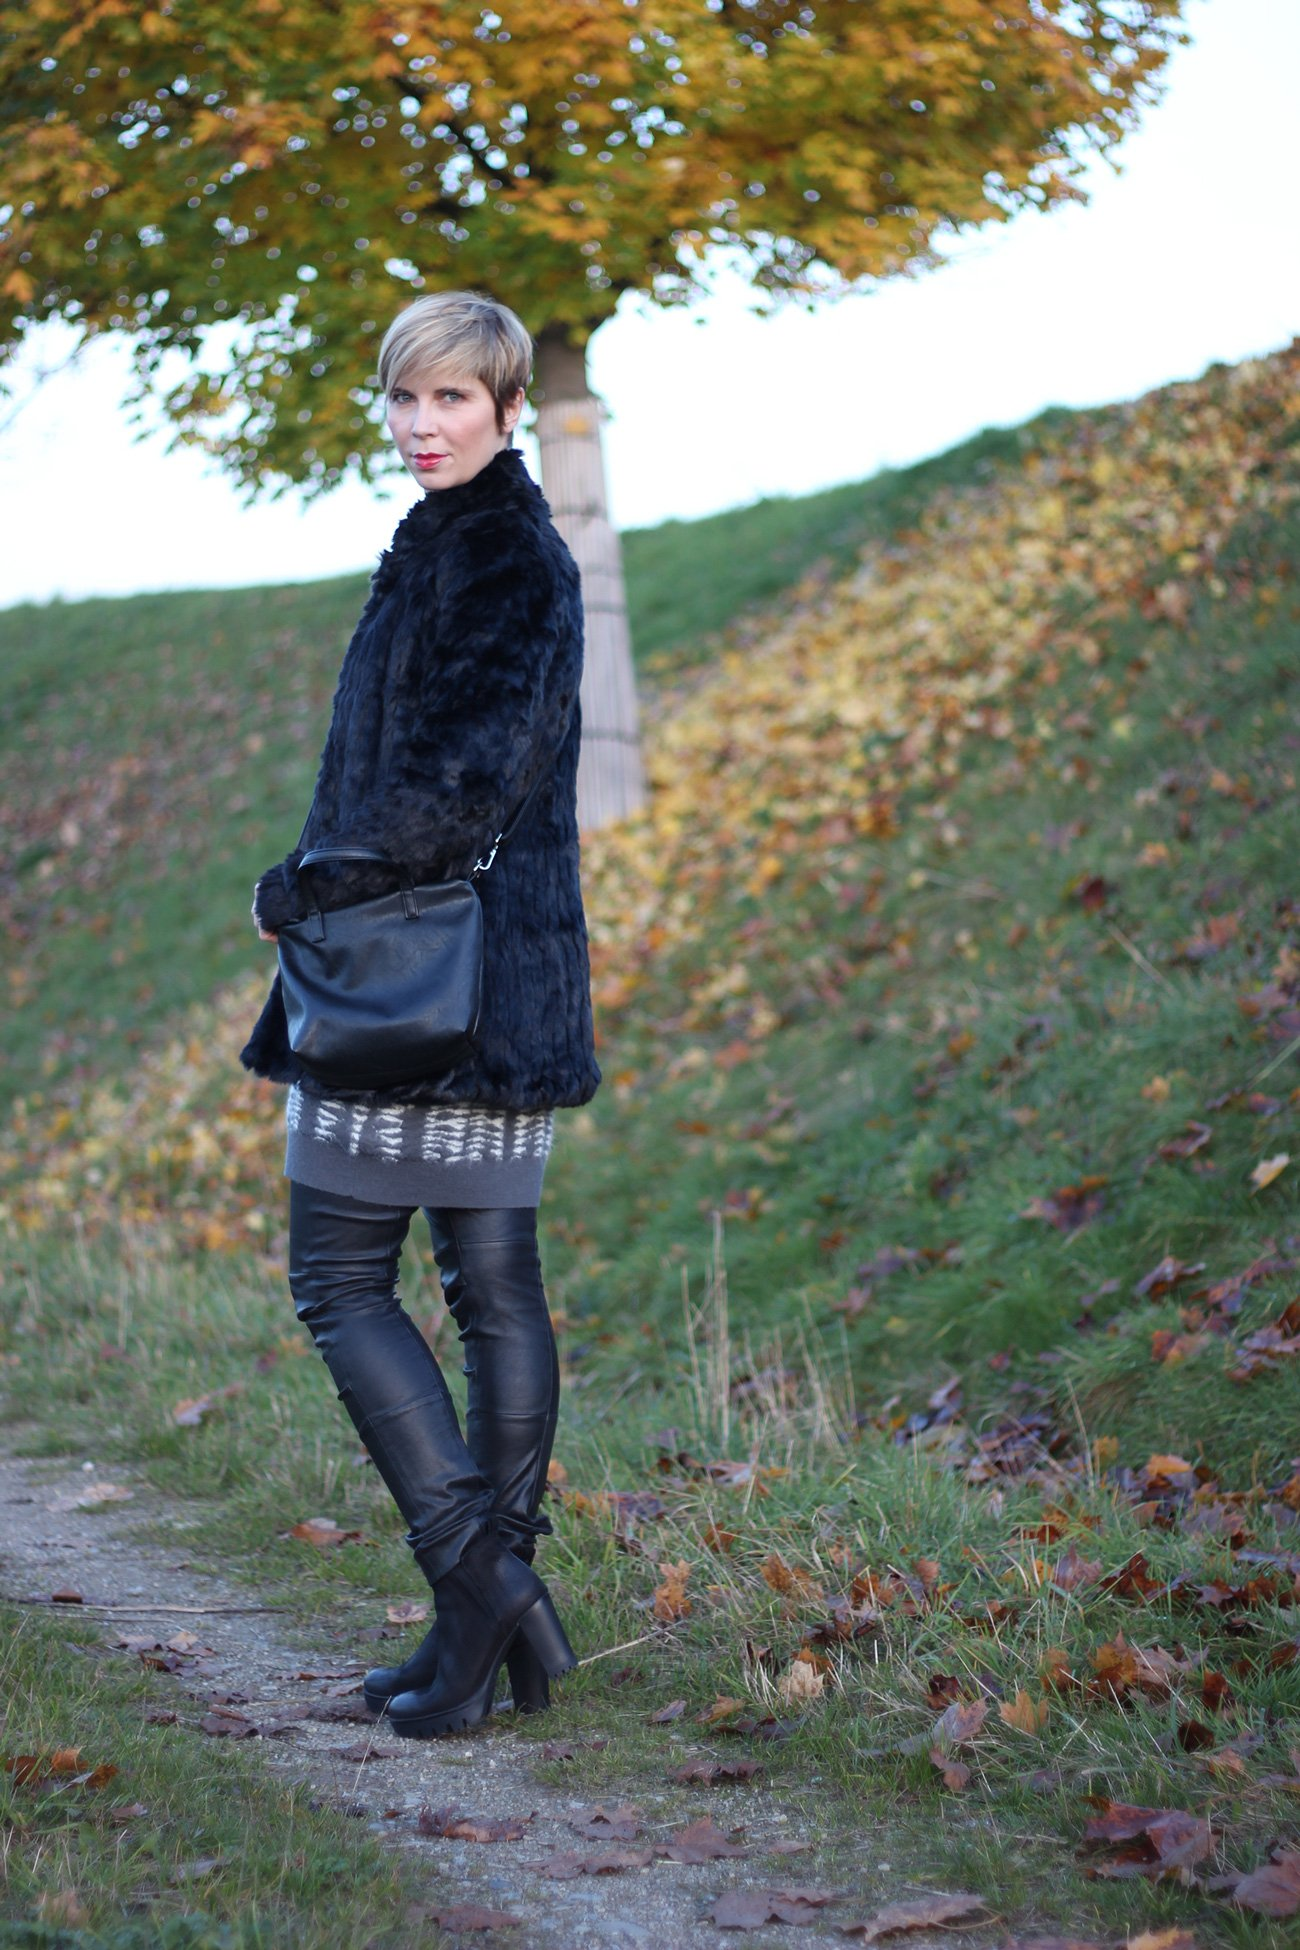 IMG_6651a_Kleid_AllSaints_Herbststyling_ConnyDoll_AHemadundahos_Strickkleid_Fashionblog_Modeblog_40plus